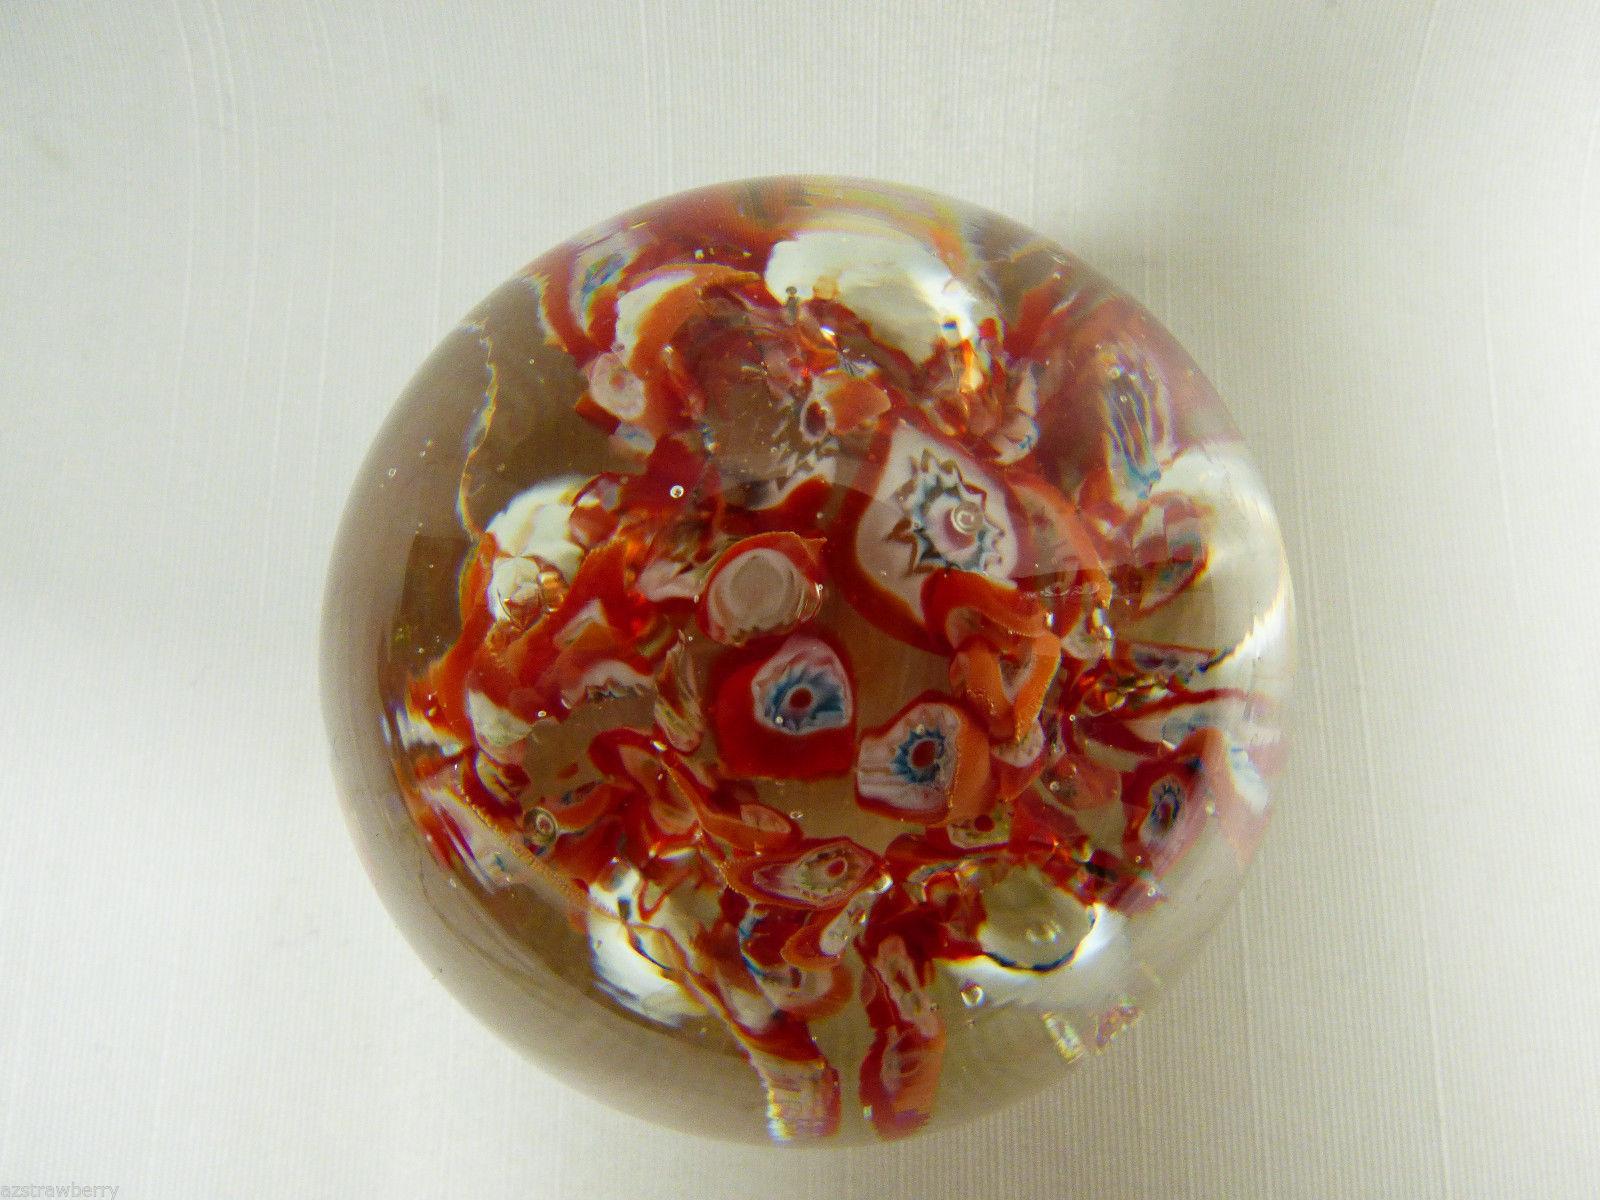 VTG Art glass Millefiori Lilly flower Red & Blue  paperweight